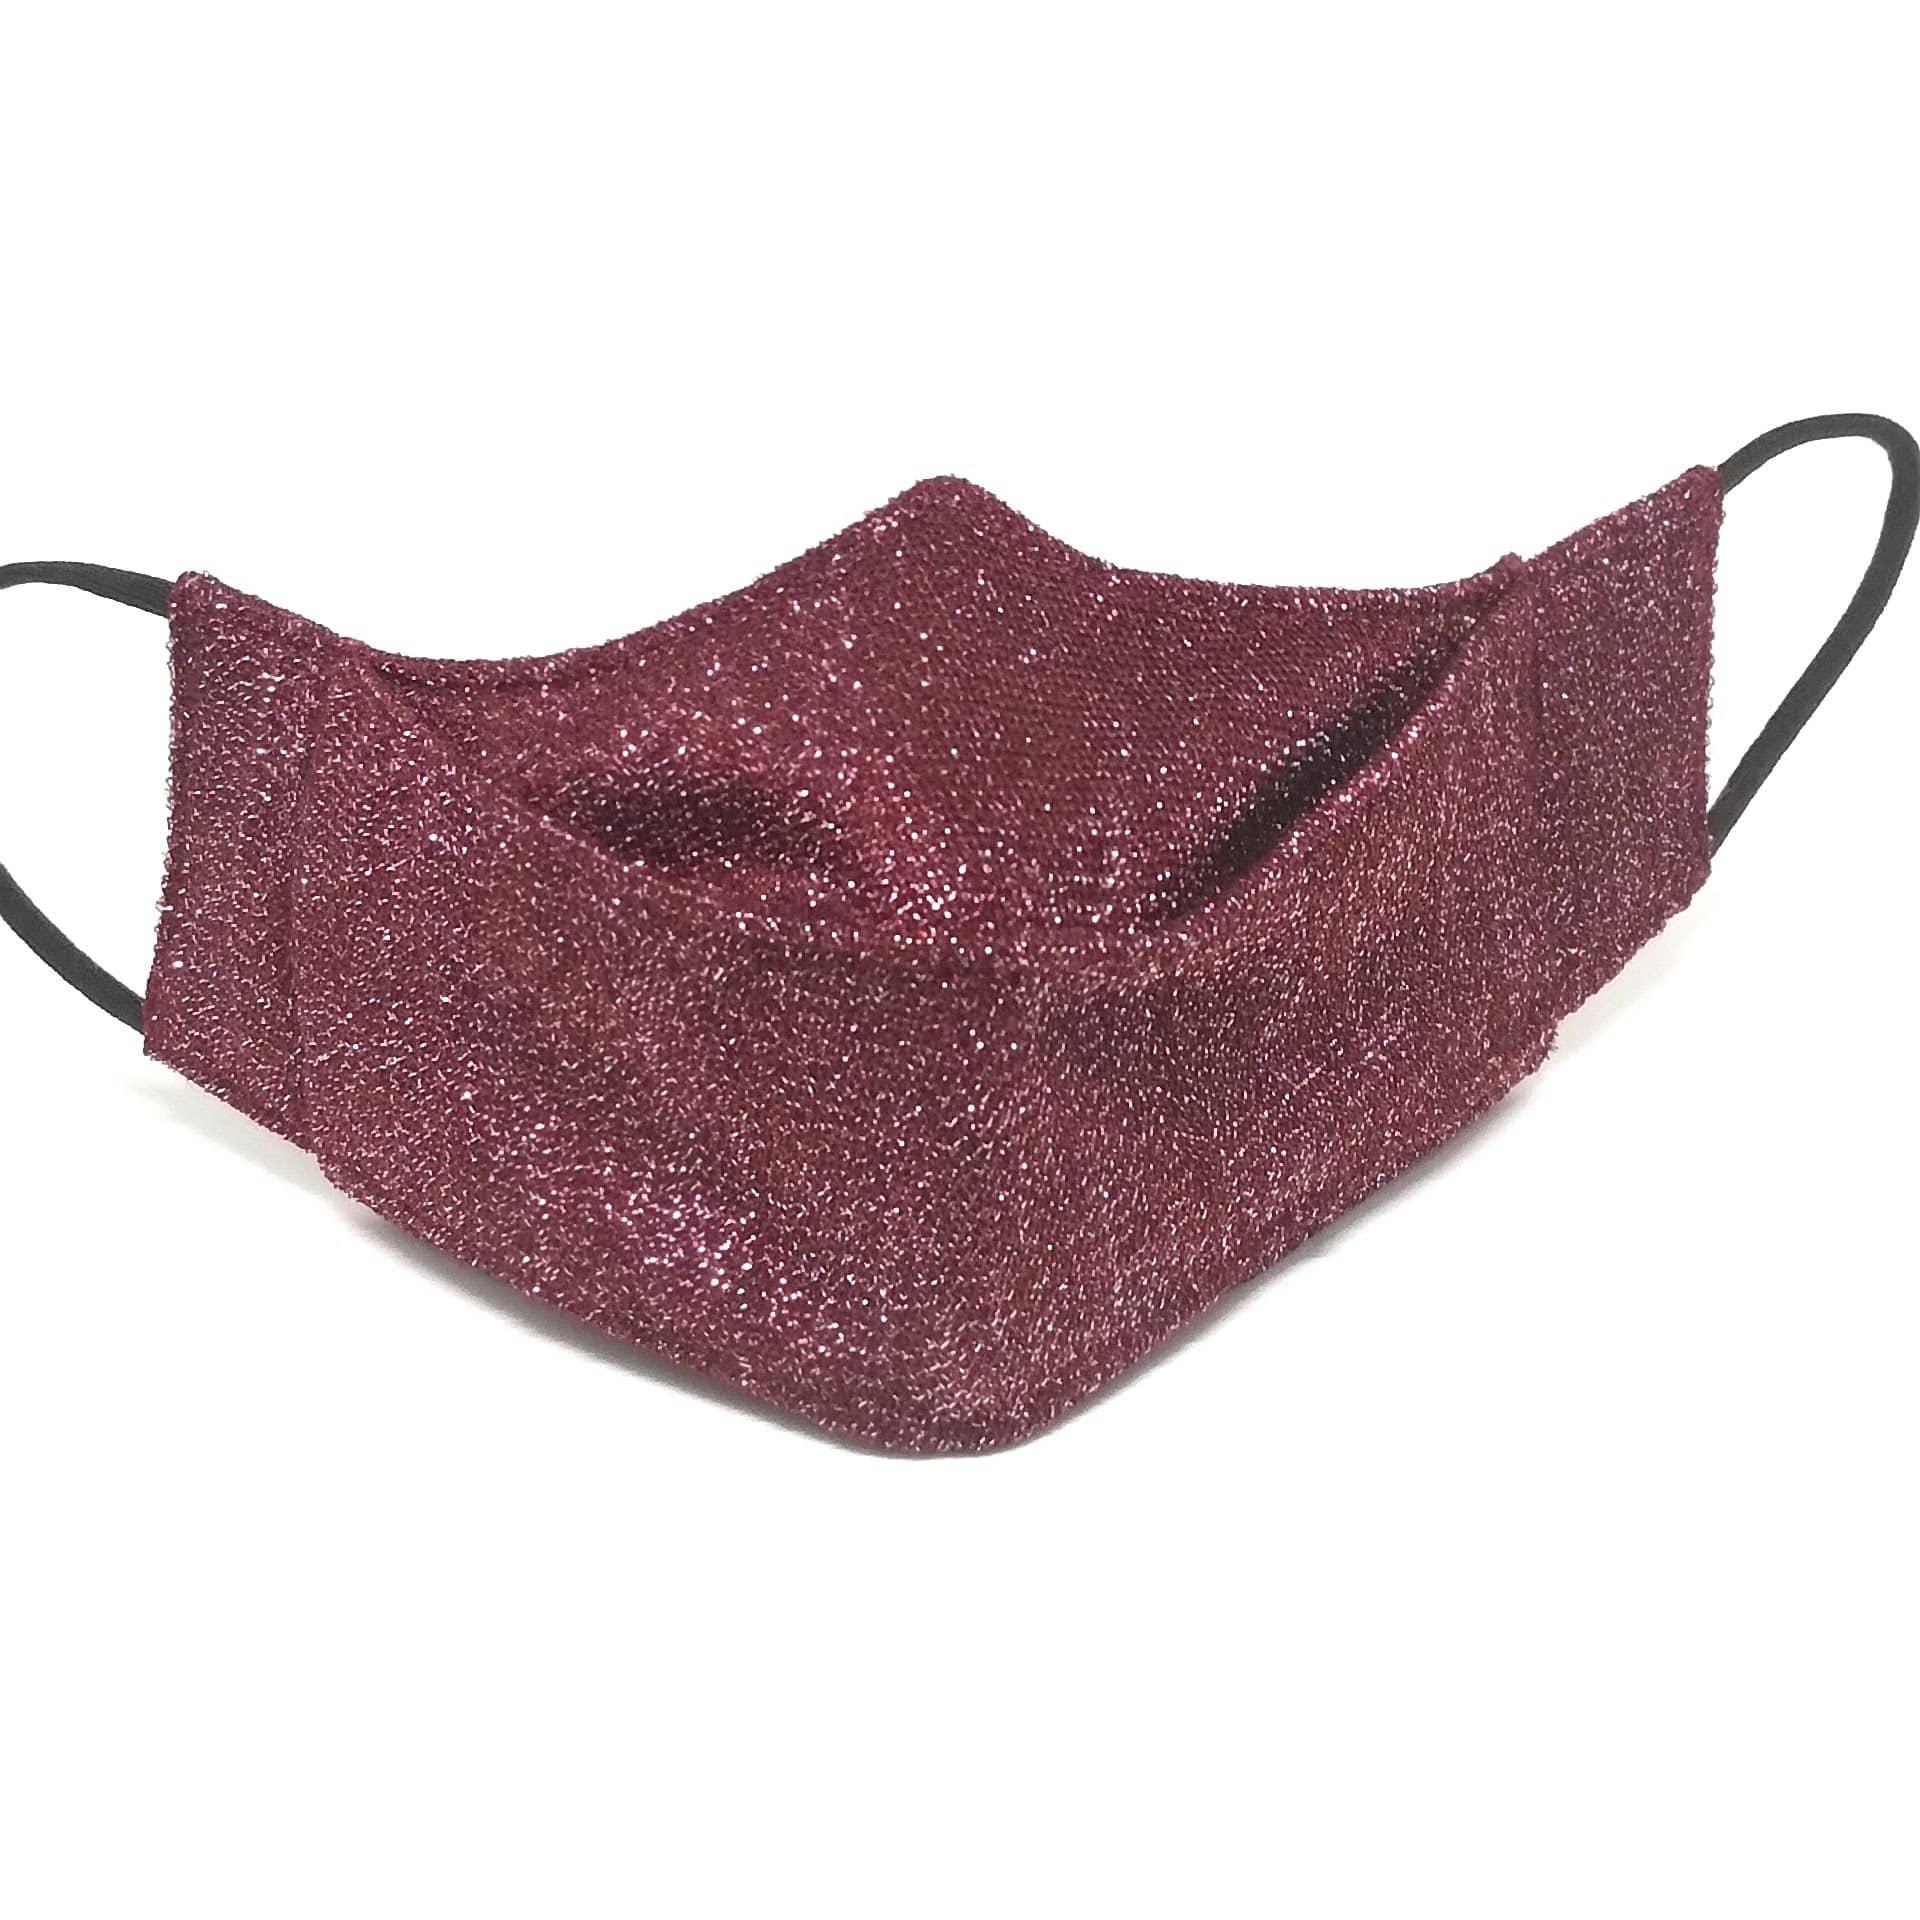 Máscara 3D Algodão Lurex Brilhoso Luxo Lavável Marsala